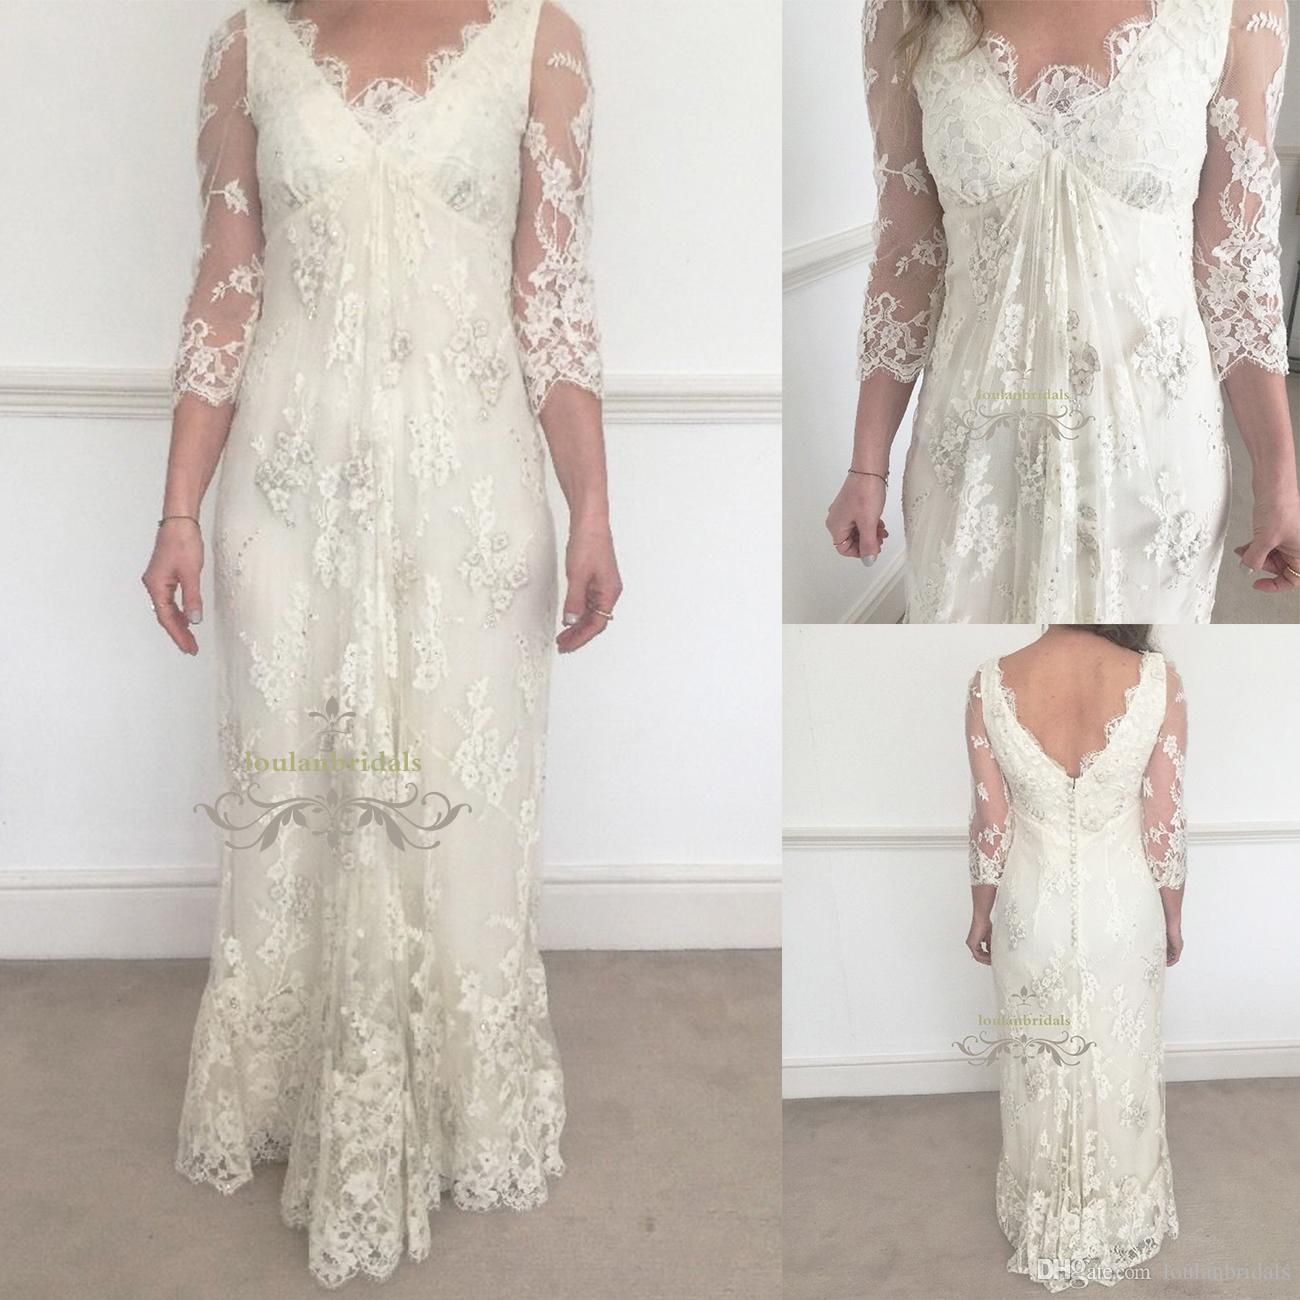 Long Lace V Neck 3/4 Sleeve Wedding Dress Beading Embroidery Lace ...